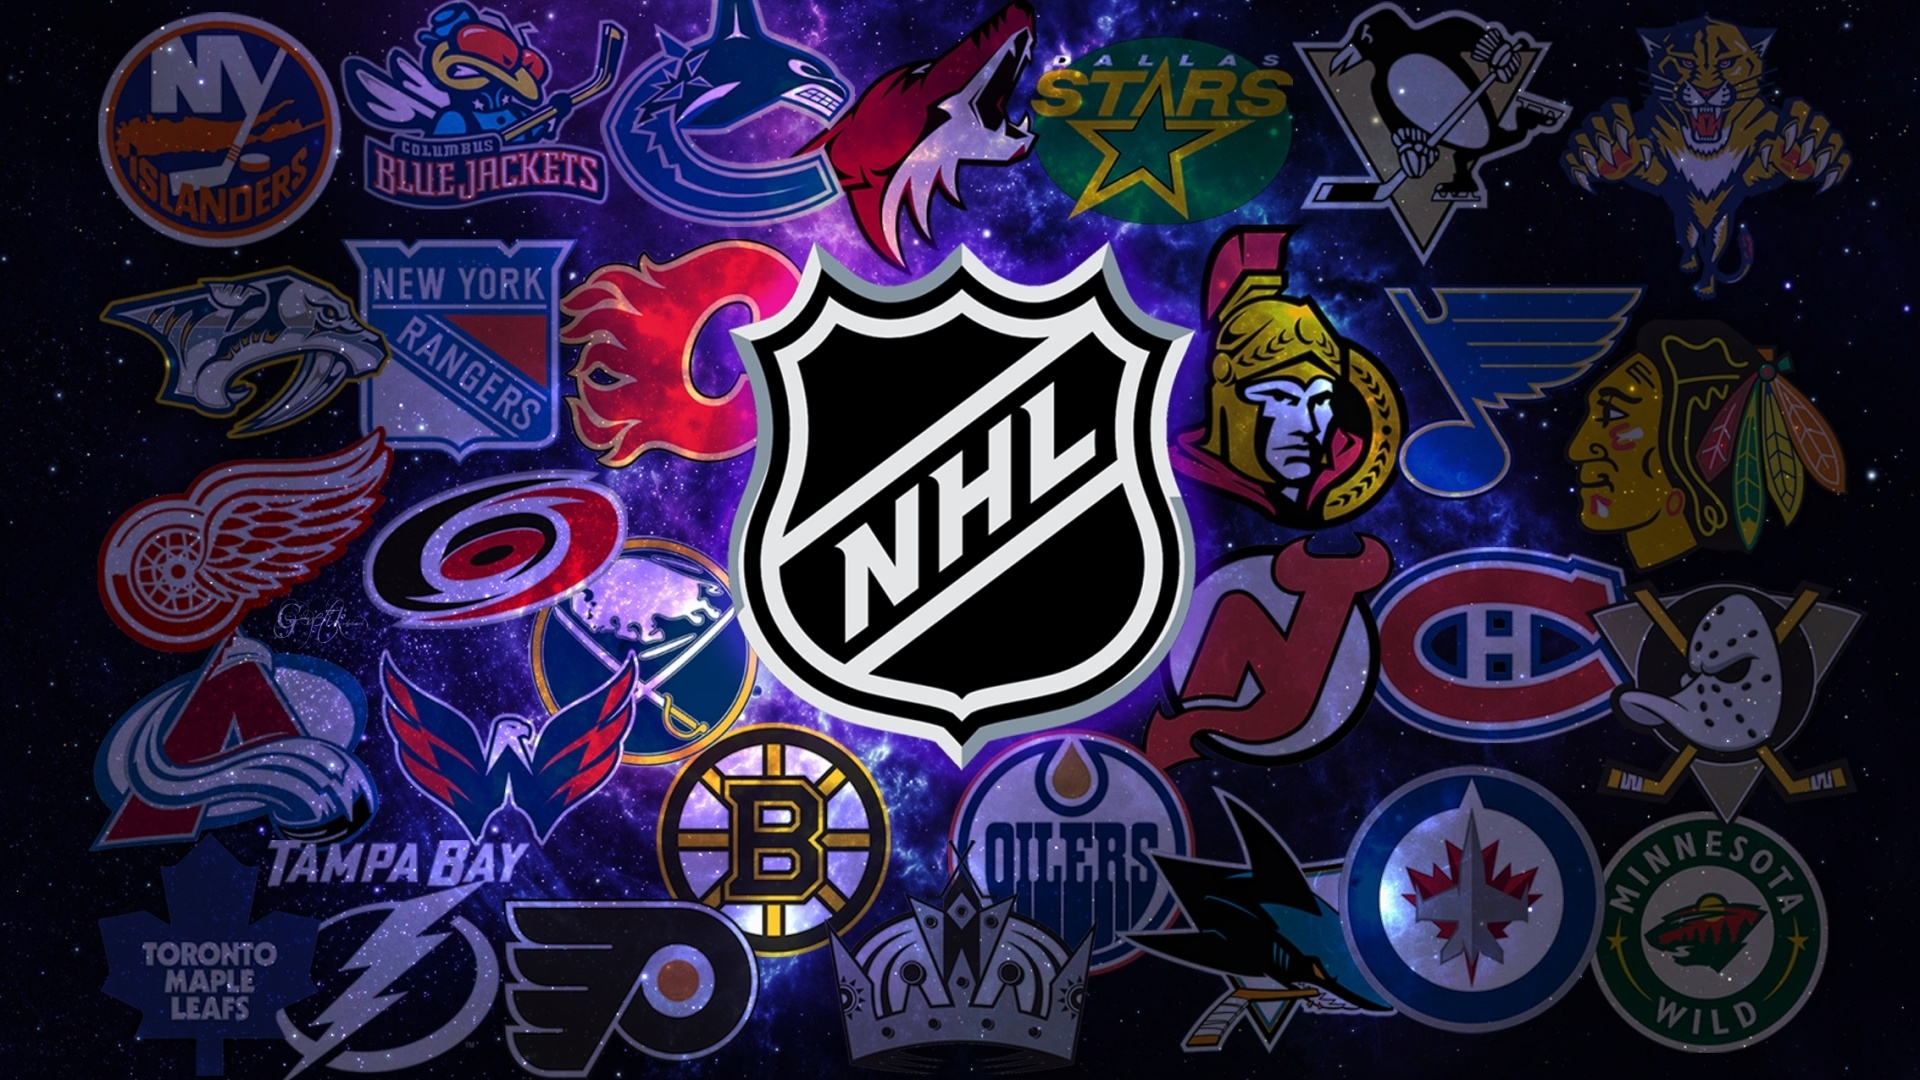 Nhl Hockey Logos 2013 images 1920x1080